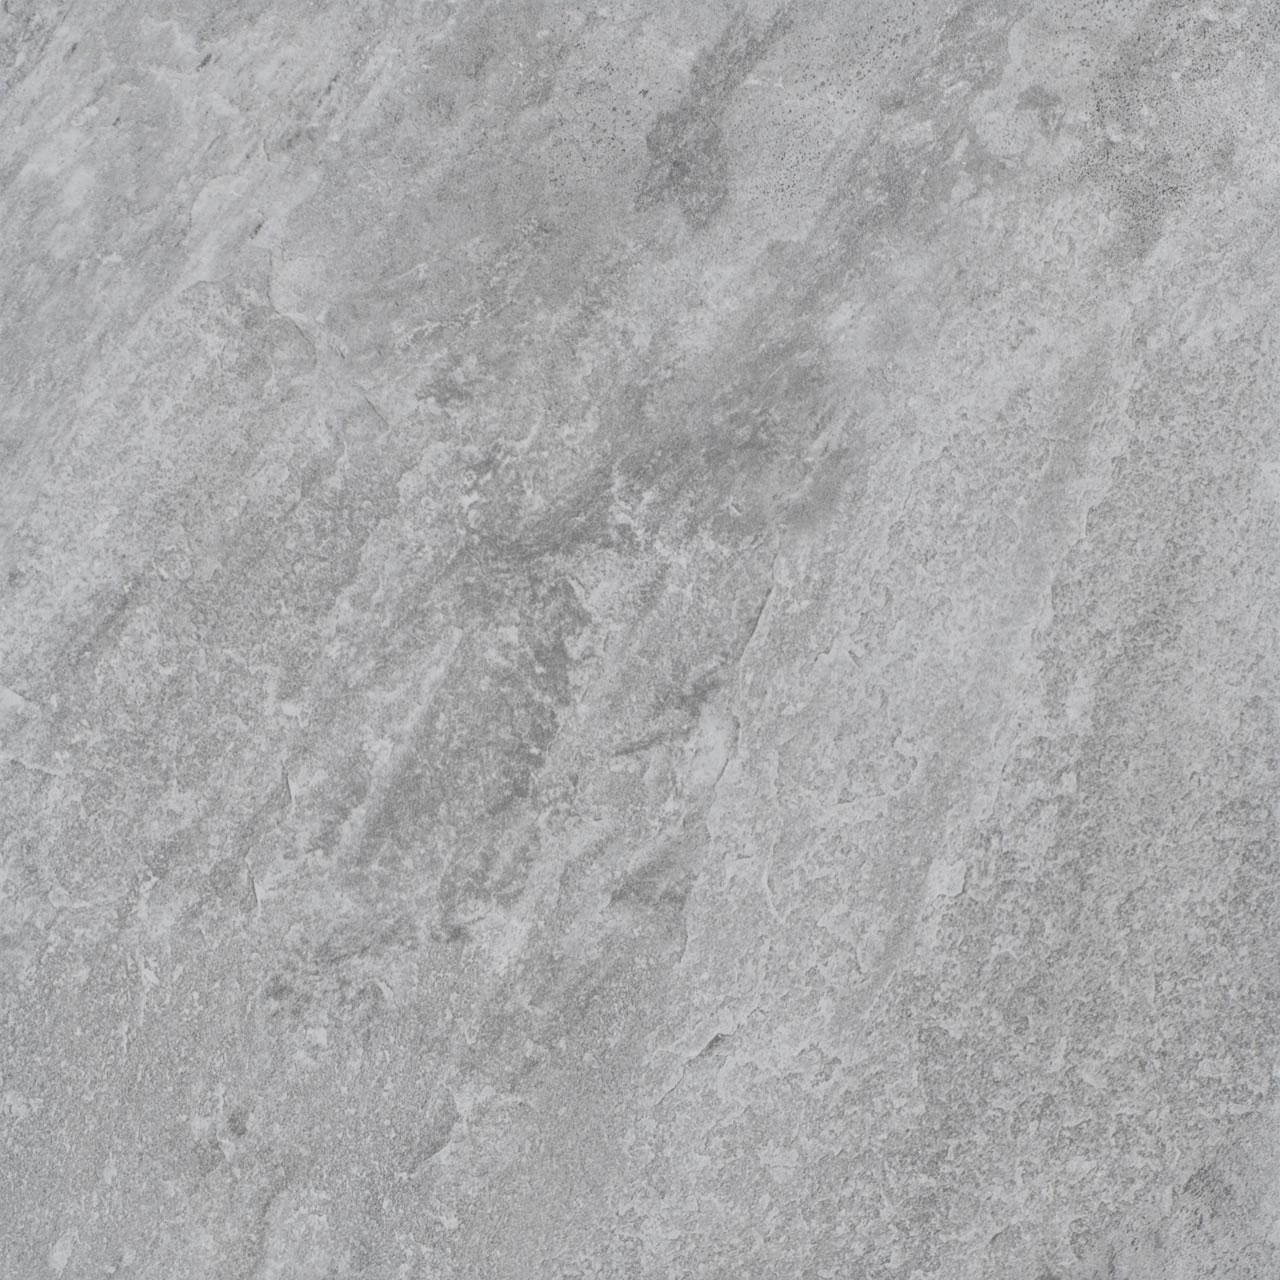 Bahia piedra gris ext 60×60